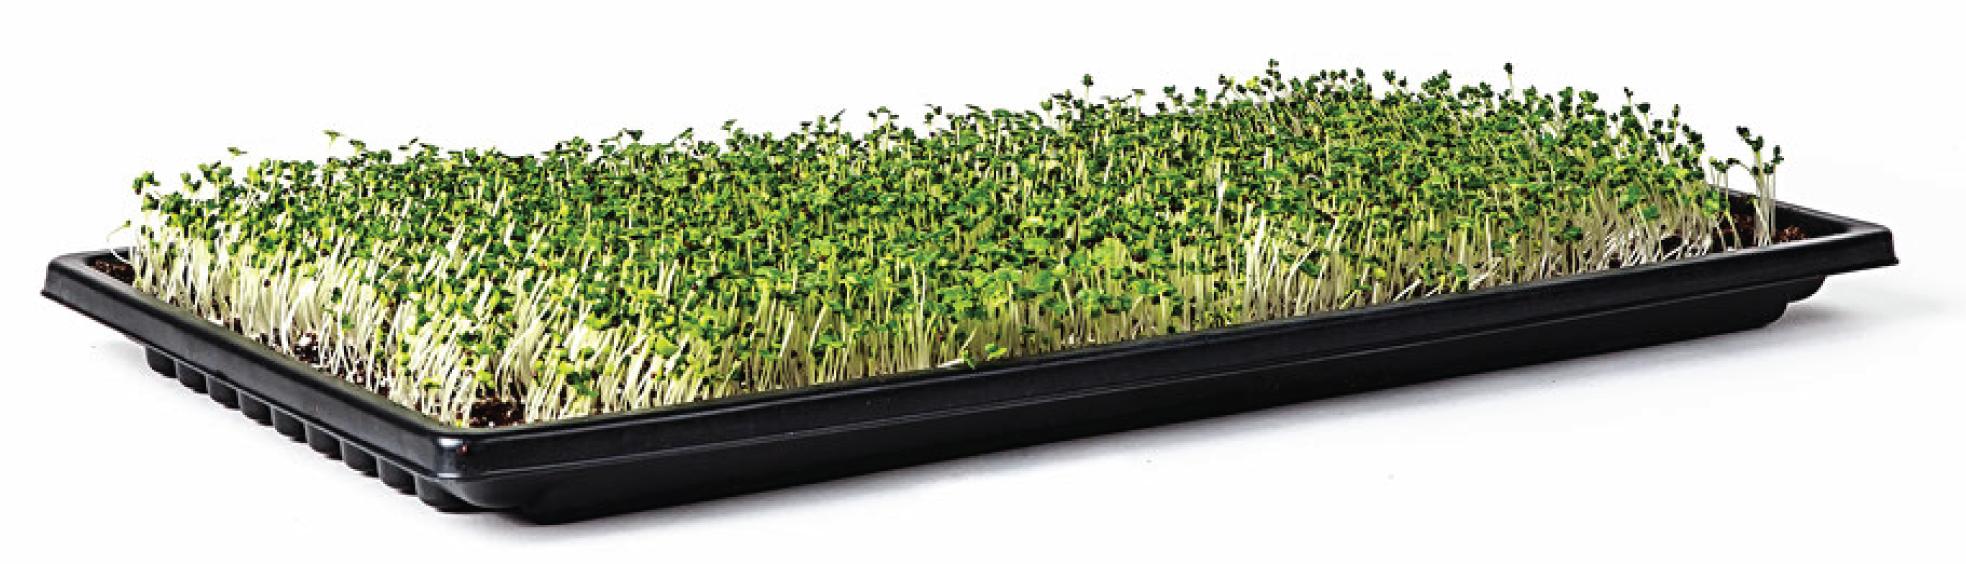 Grown Microgreens in Tray